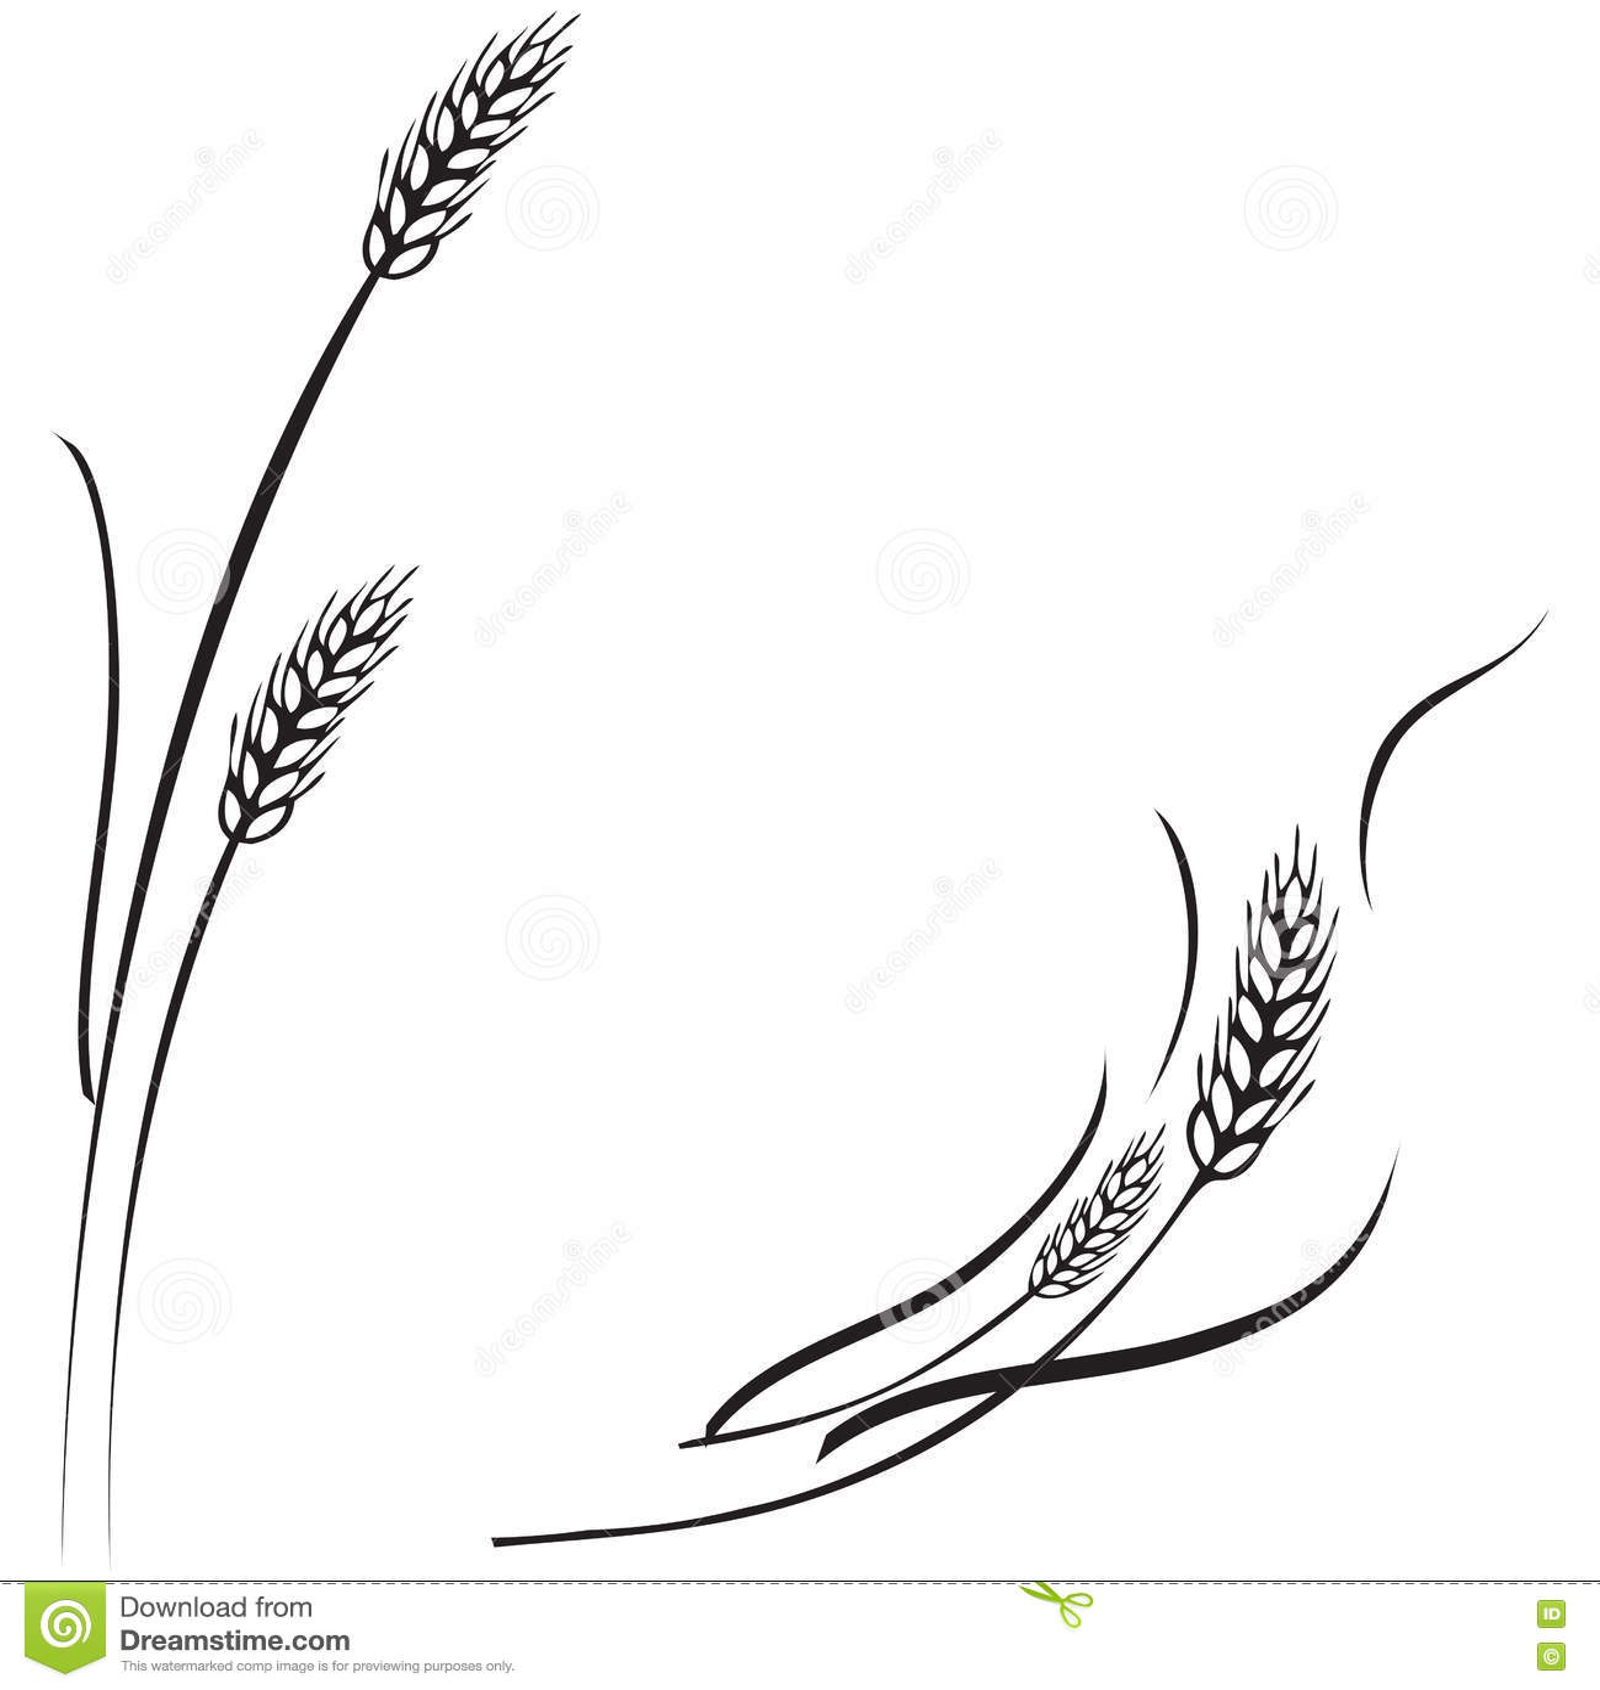 Wheat Ears Frame Border Or Corner Element Royalty Free Stock Photo